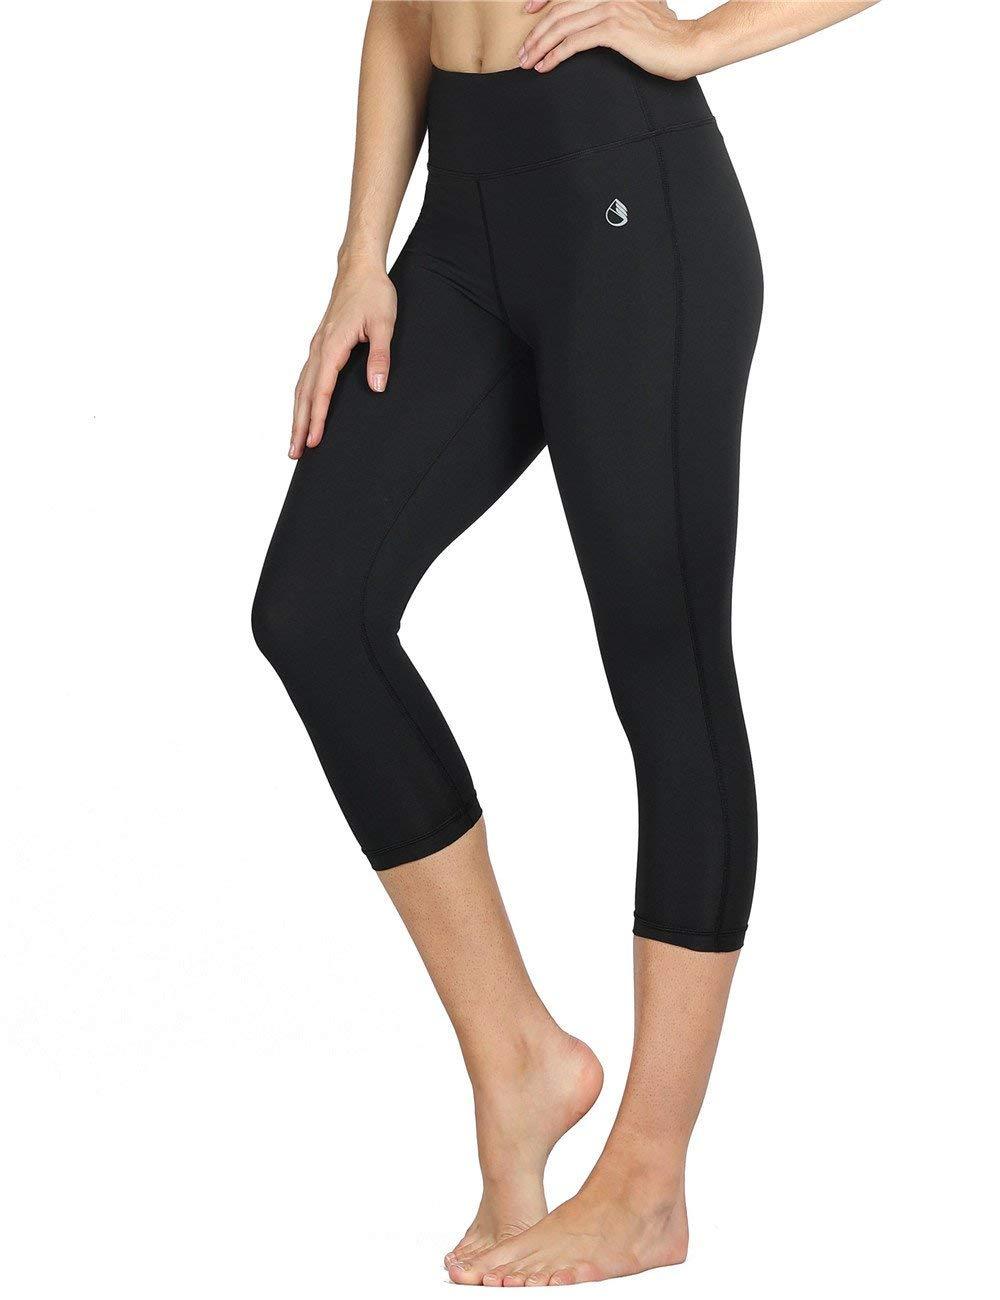 icyzone Women Workout Clothes Athletic Leggings Capri Activewear Hot Yoga Pants